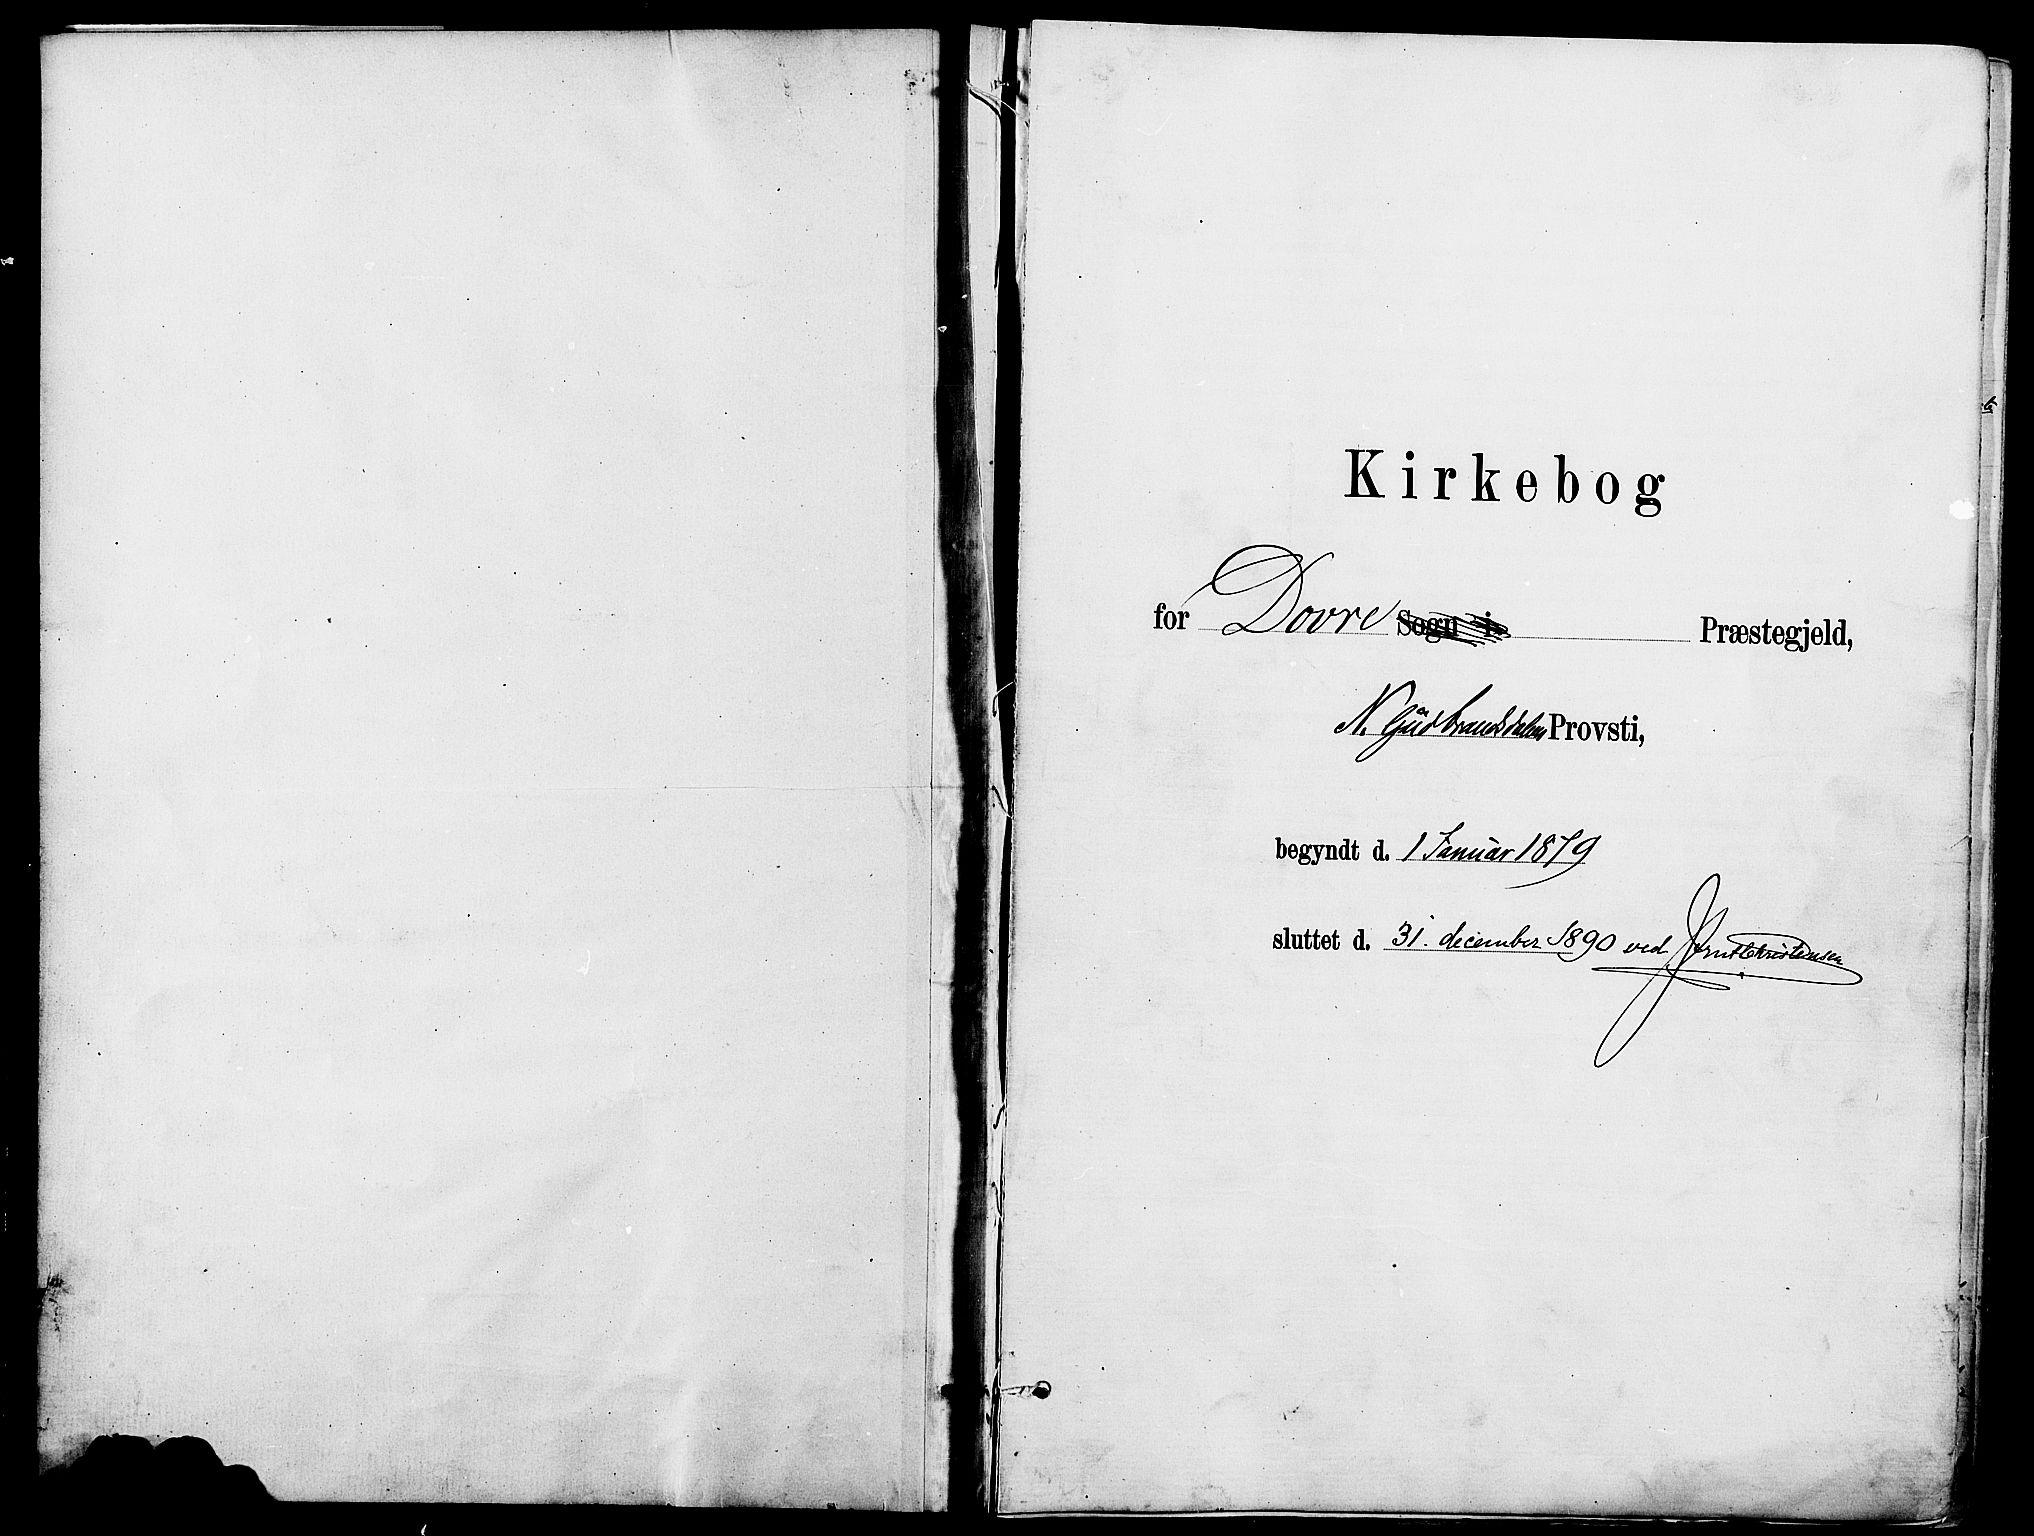 SAH, Dovre prestekontor, Ministerialbok nr. 2, 1879-1890